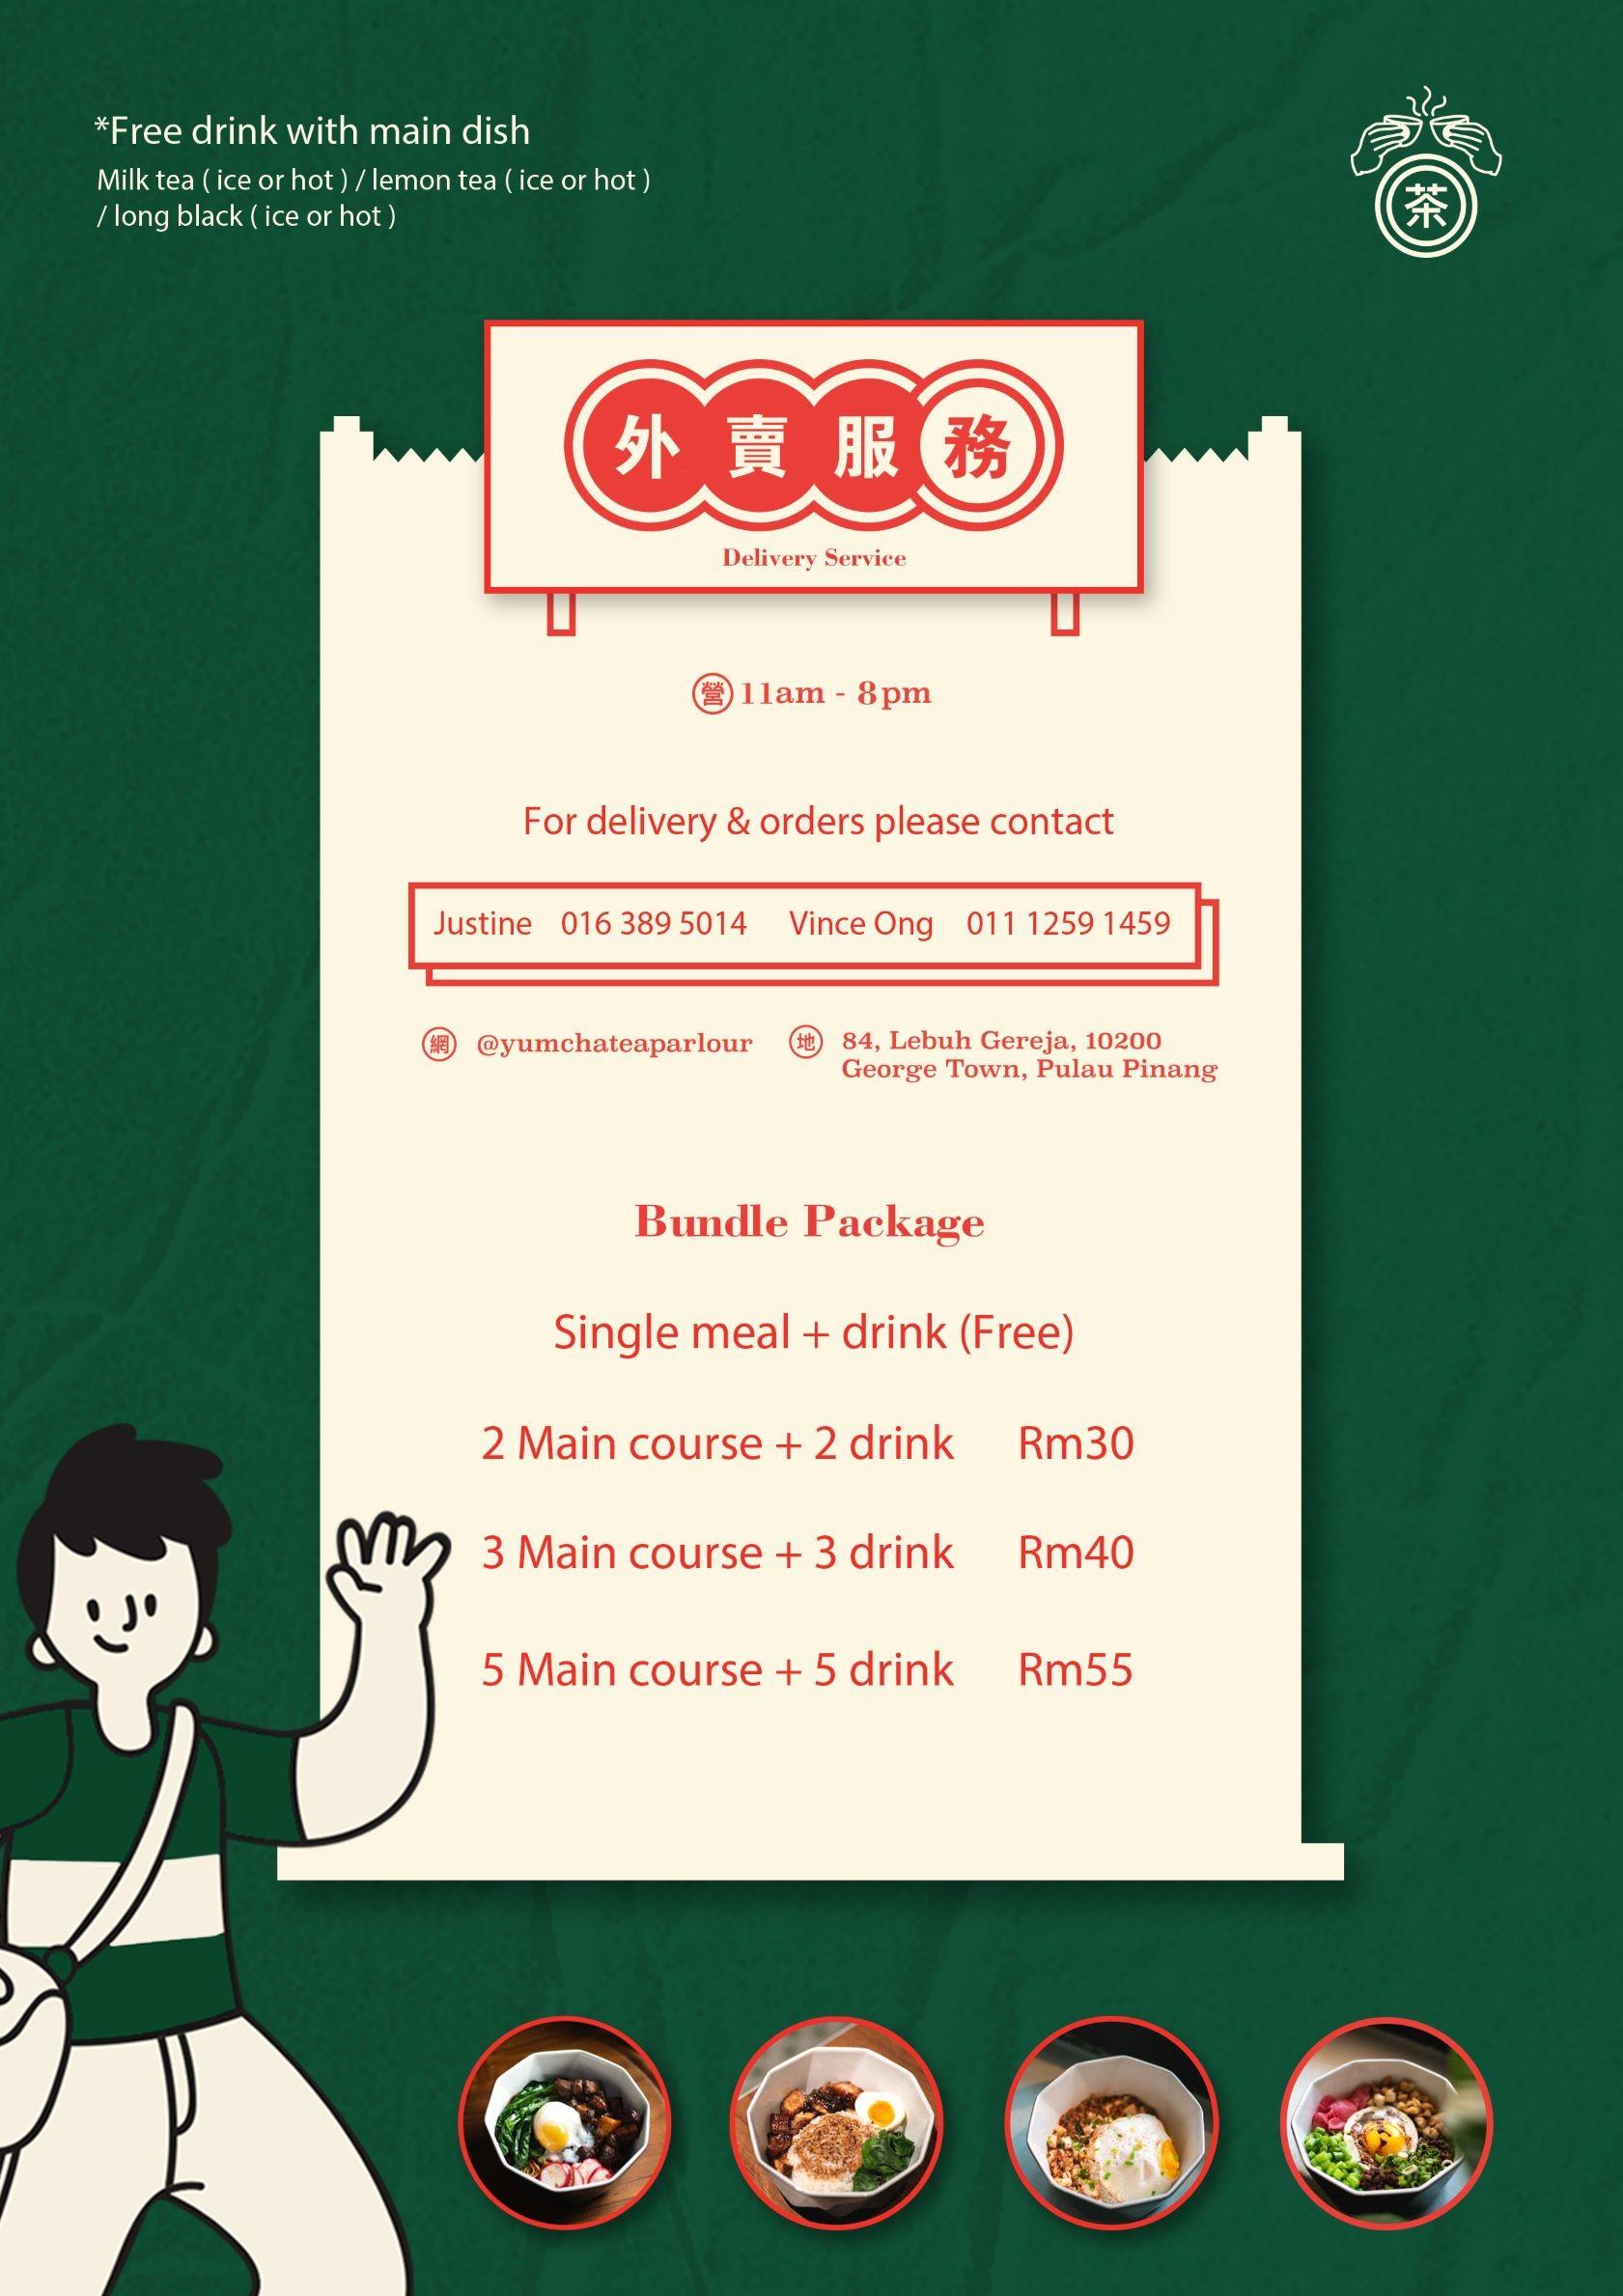 Bundle Package by Yum Cha Tea Parlour